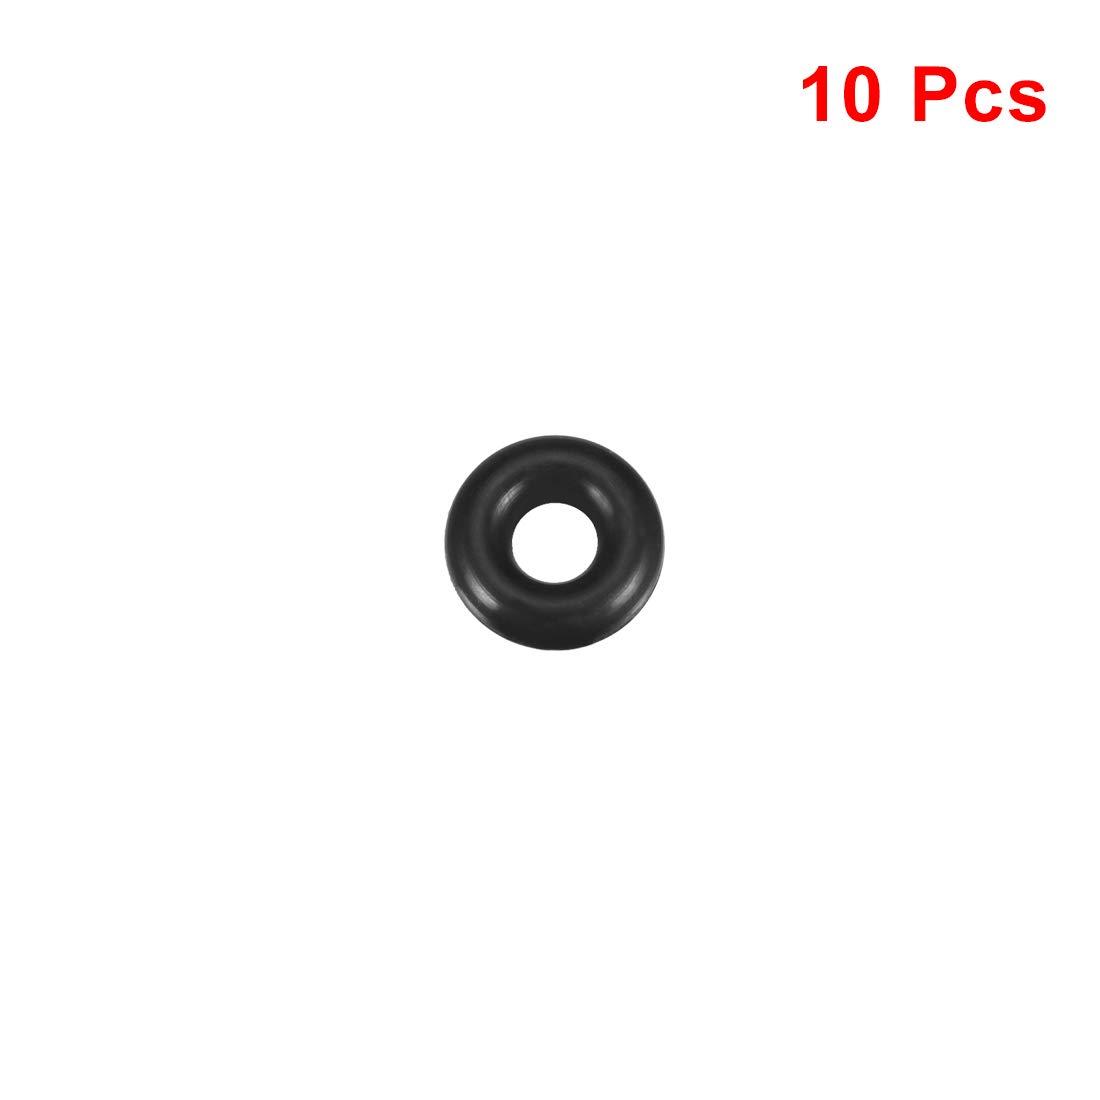 3,5mm Breite de 6mm Innendurchmesser O Ringe Nitrile Gummidichtung sourcing map 10 Stk